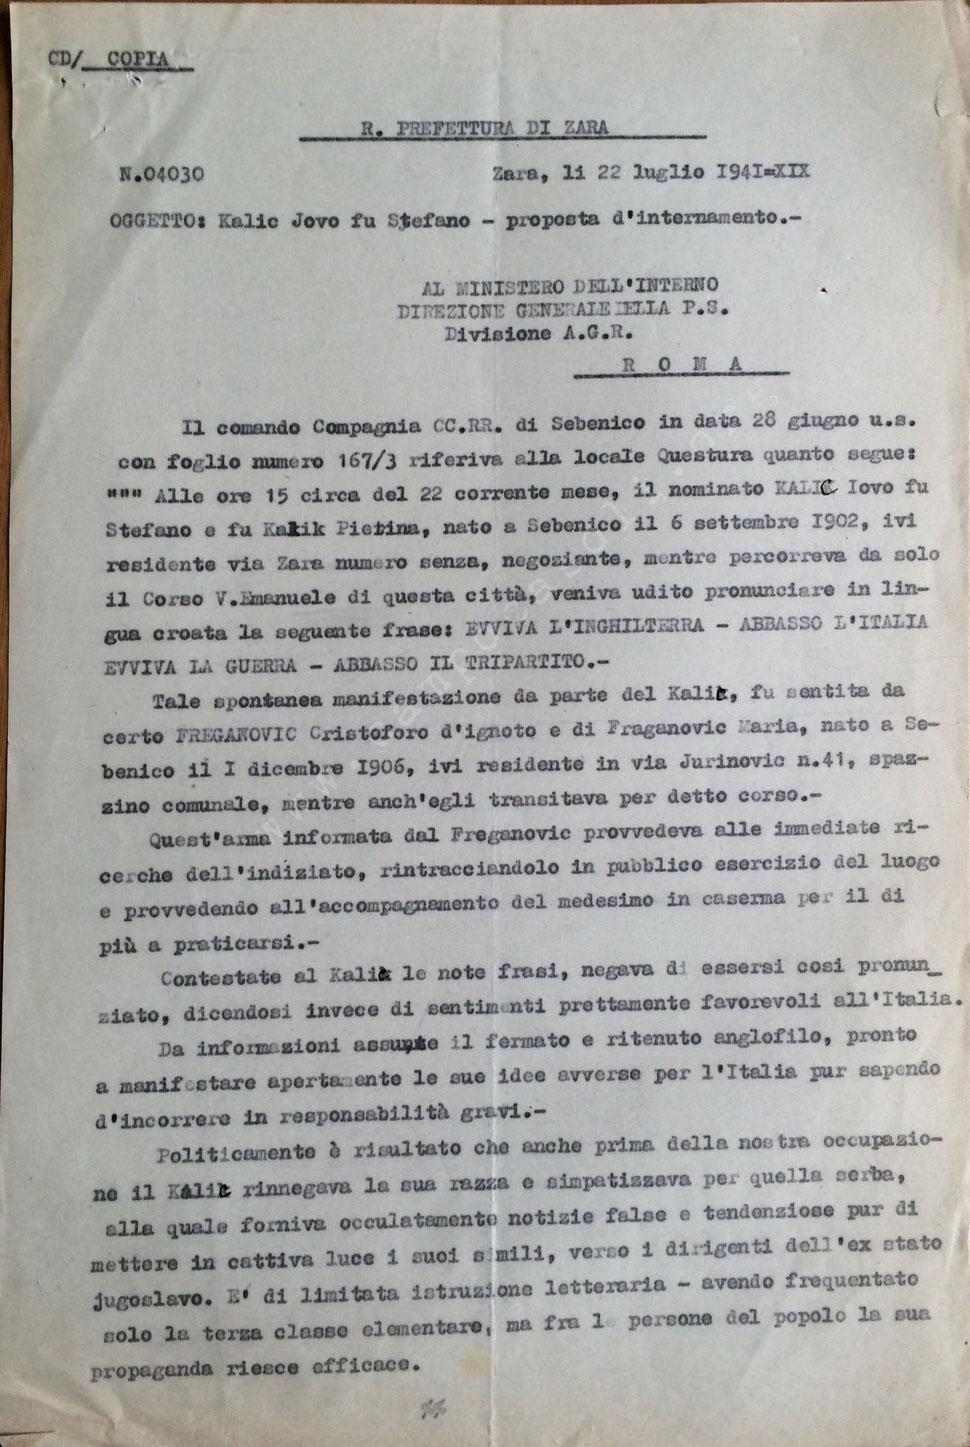 Provvedimento di internamento per Kalik Jovo fu Stefano, foglio 1,  (Busta 3, Fasc. 95)